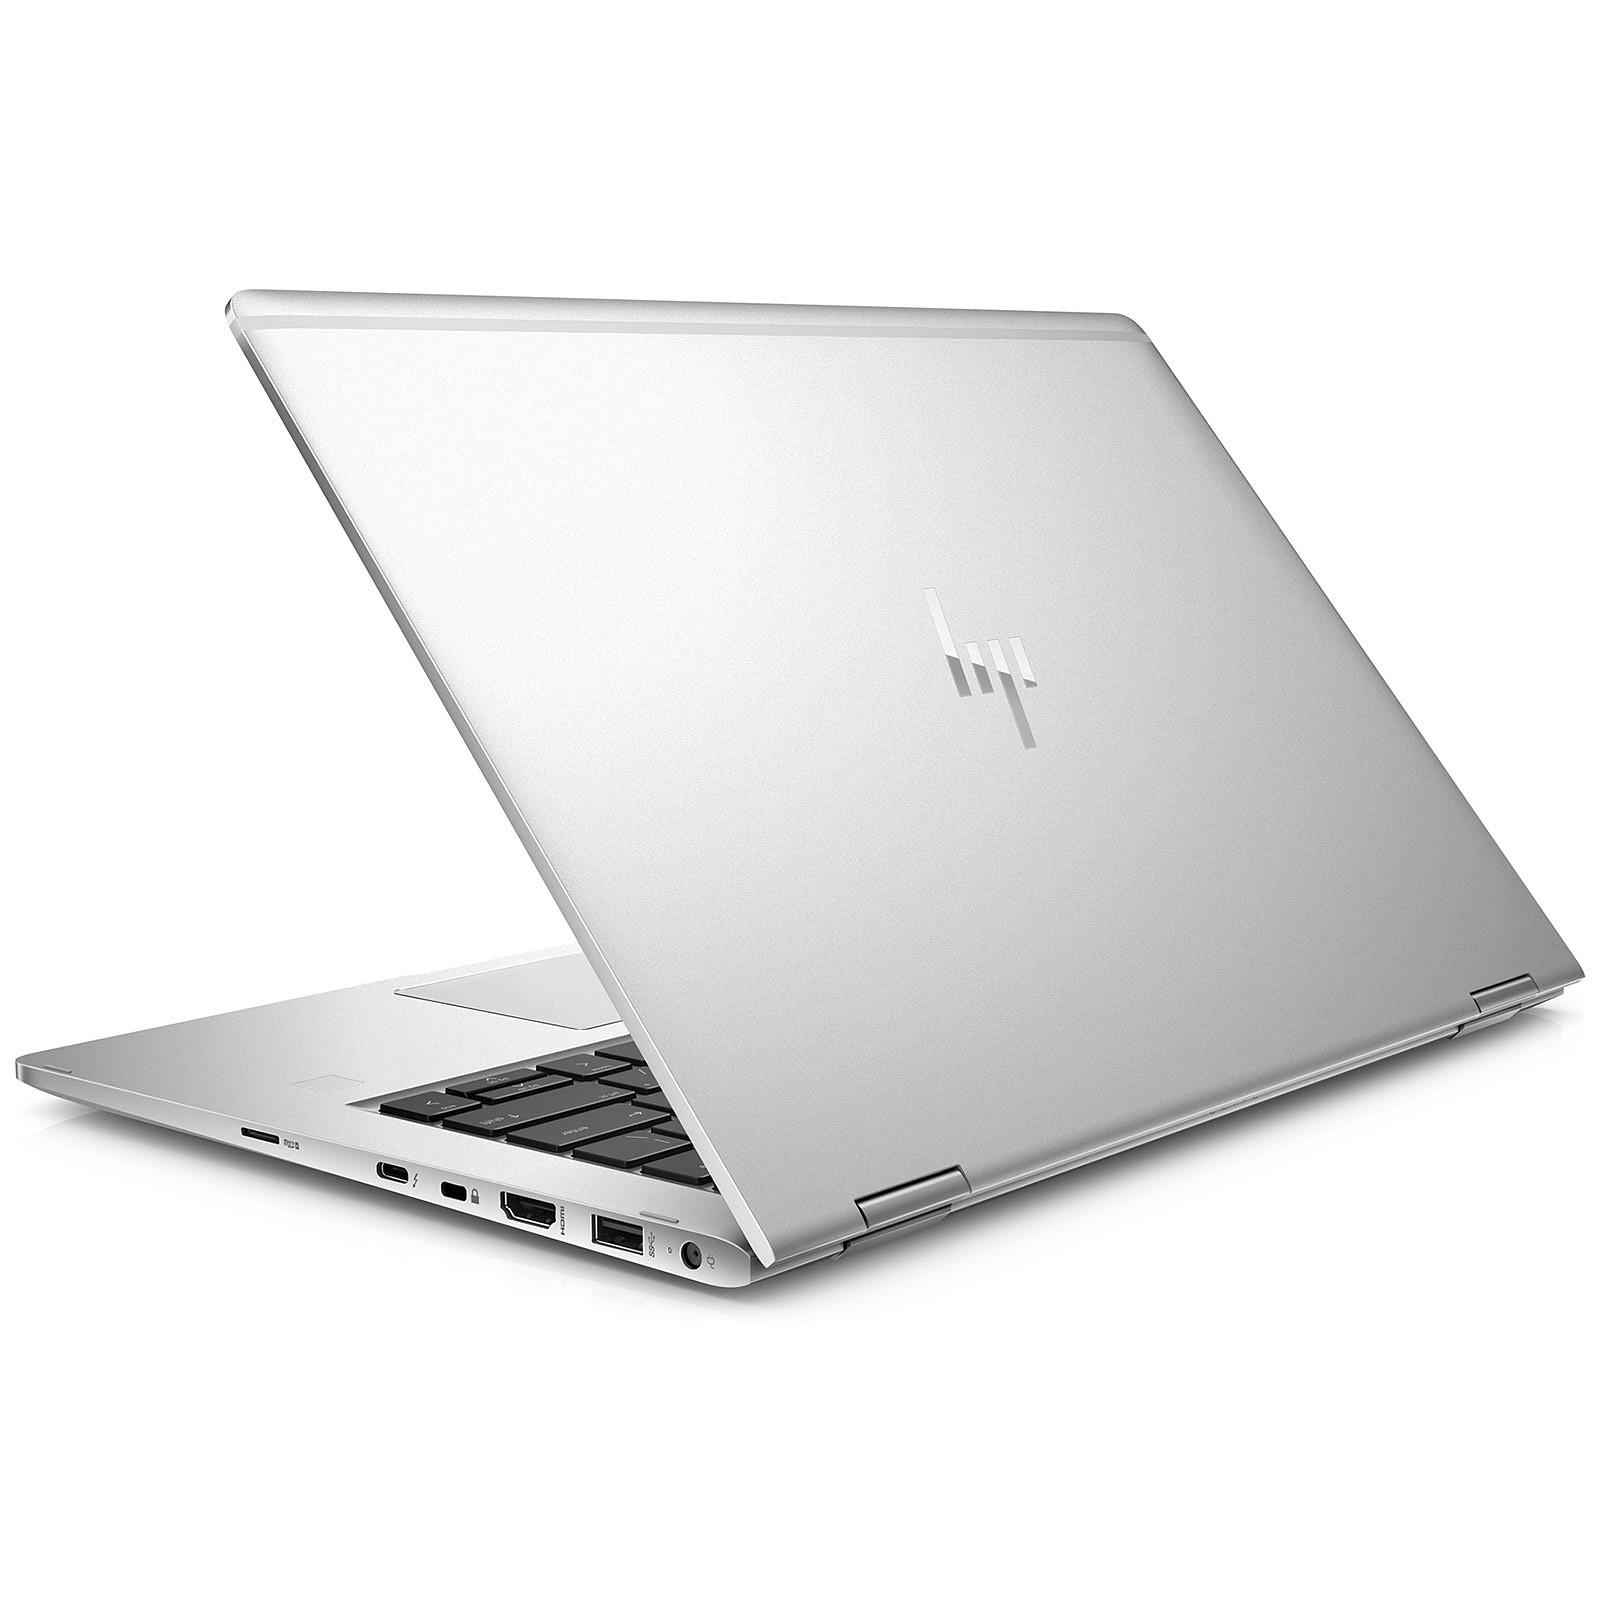 "Hp EliteBook X360 1030 G2 13"" Core i7 2,8 GHz - SSD 500 Go - 16 Go QWERTY - Anglais (US)"